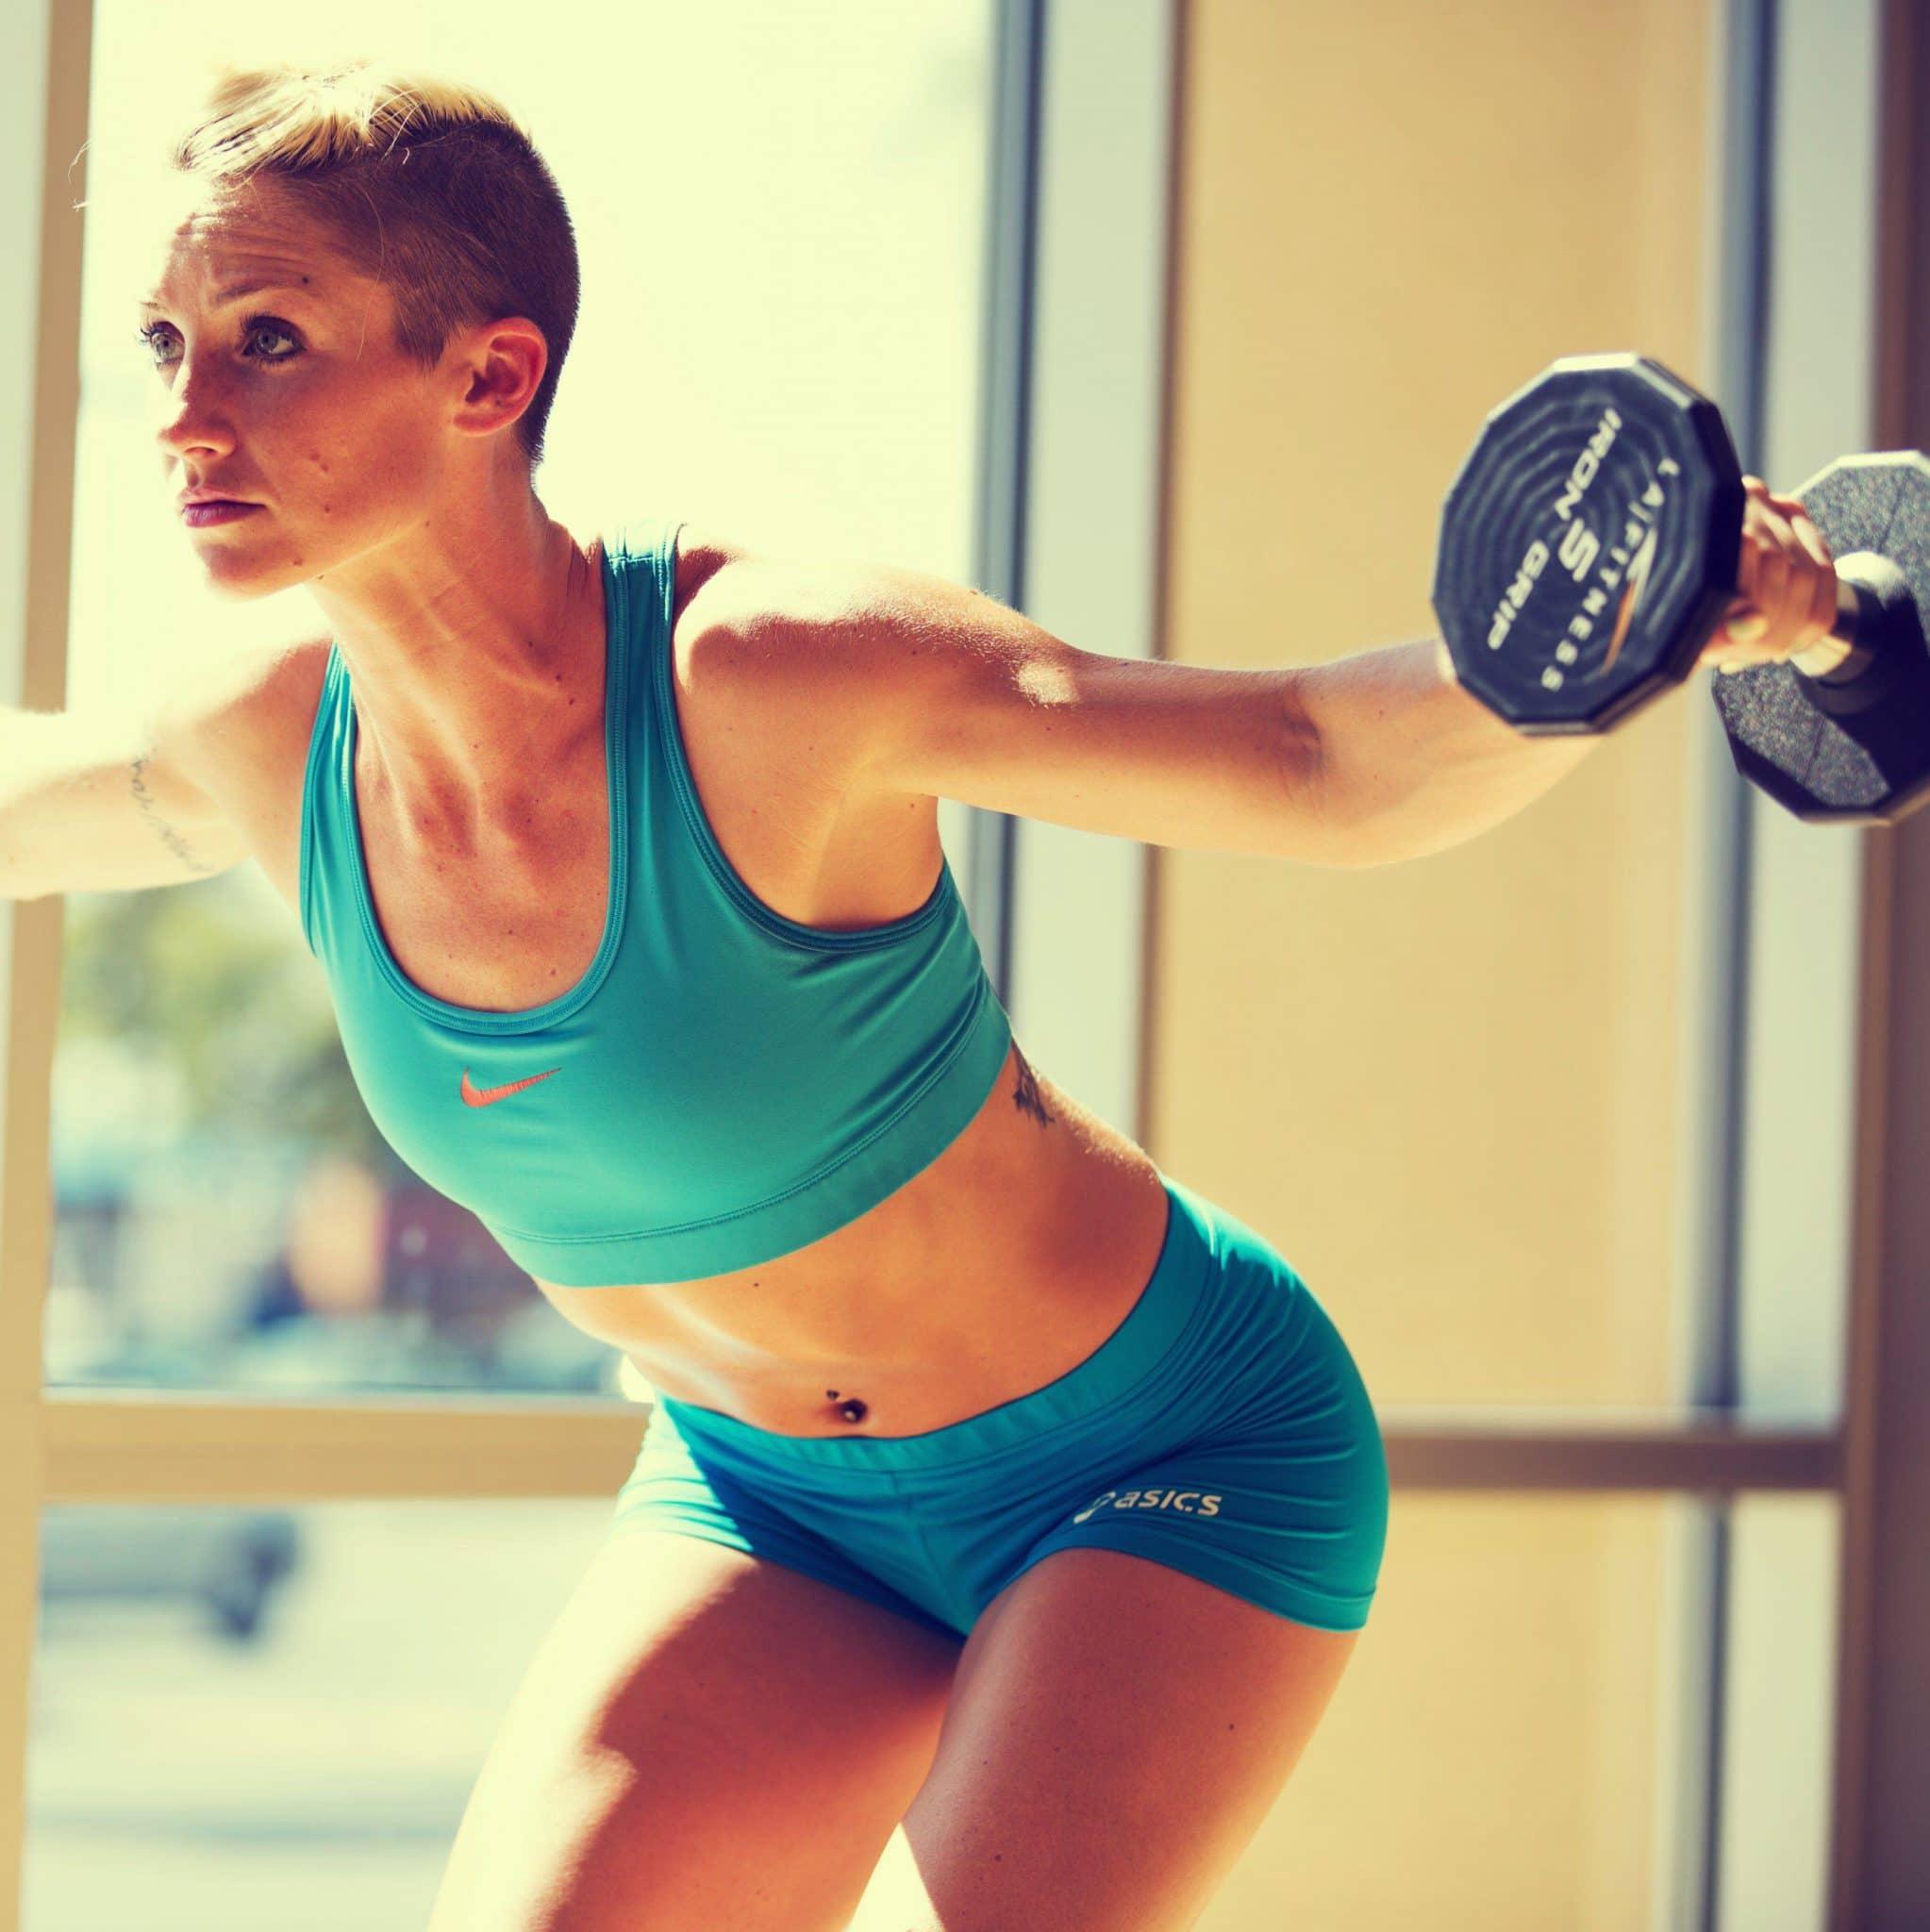 dumbbell-back-exercises-at-la-fitness-2